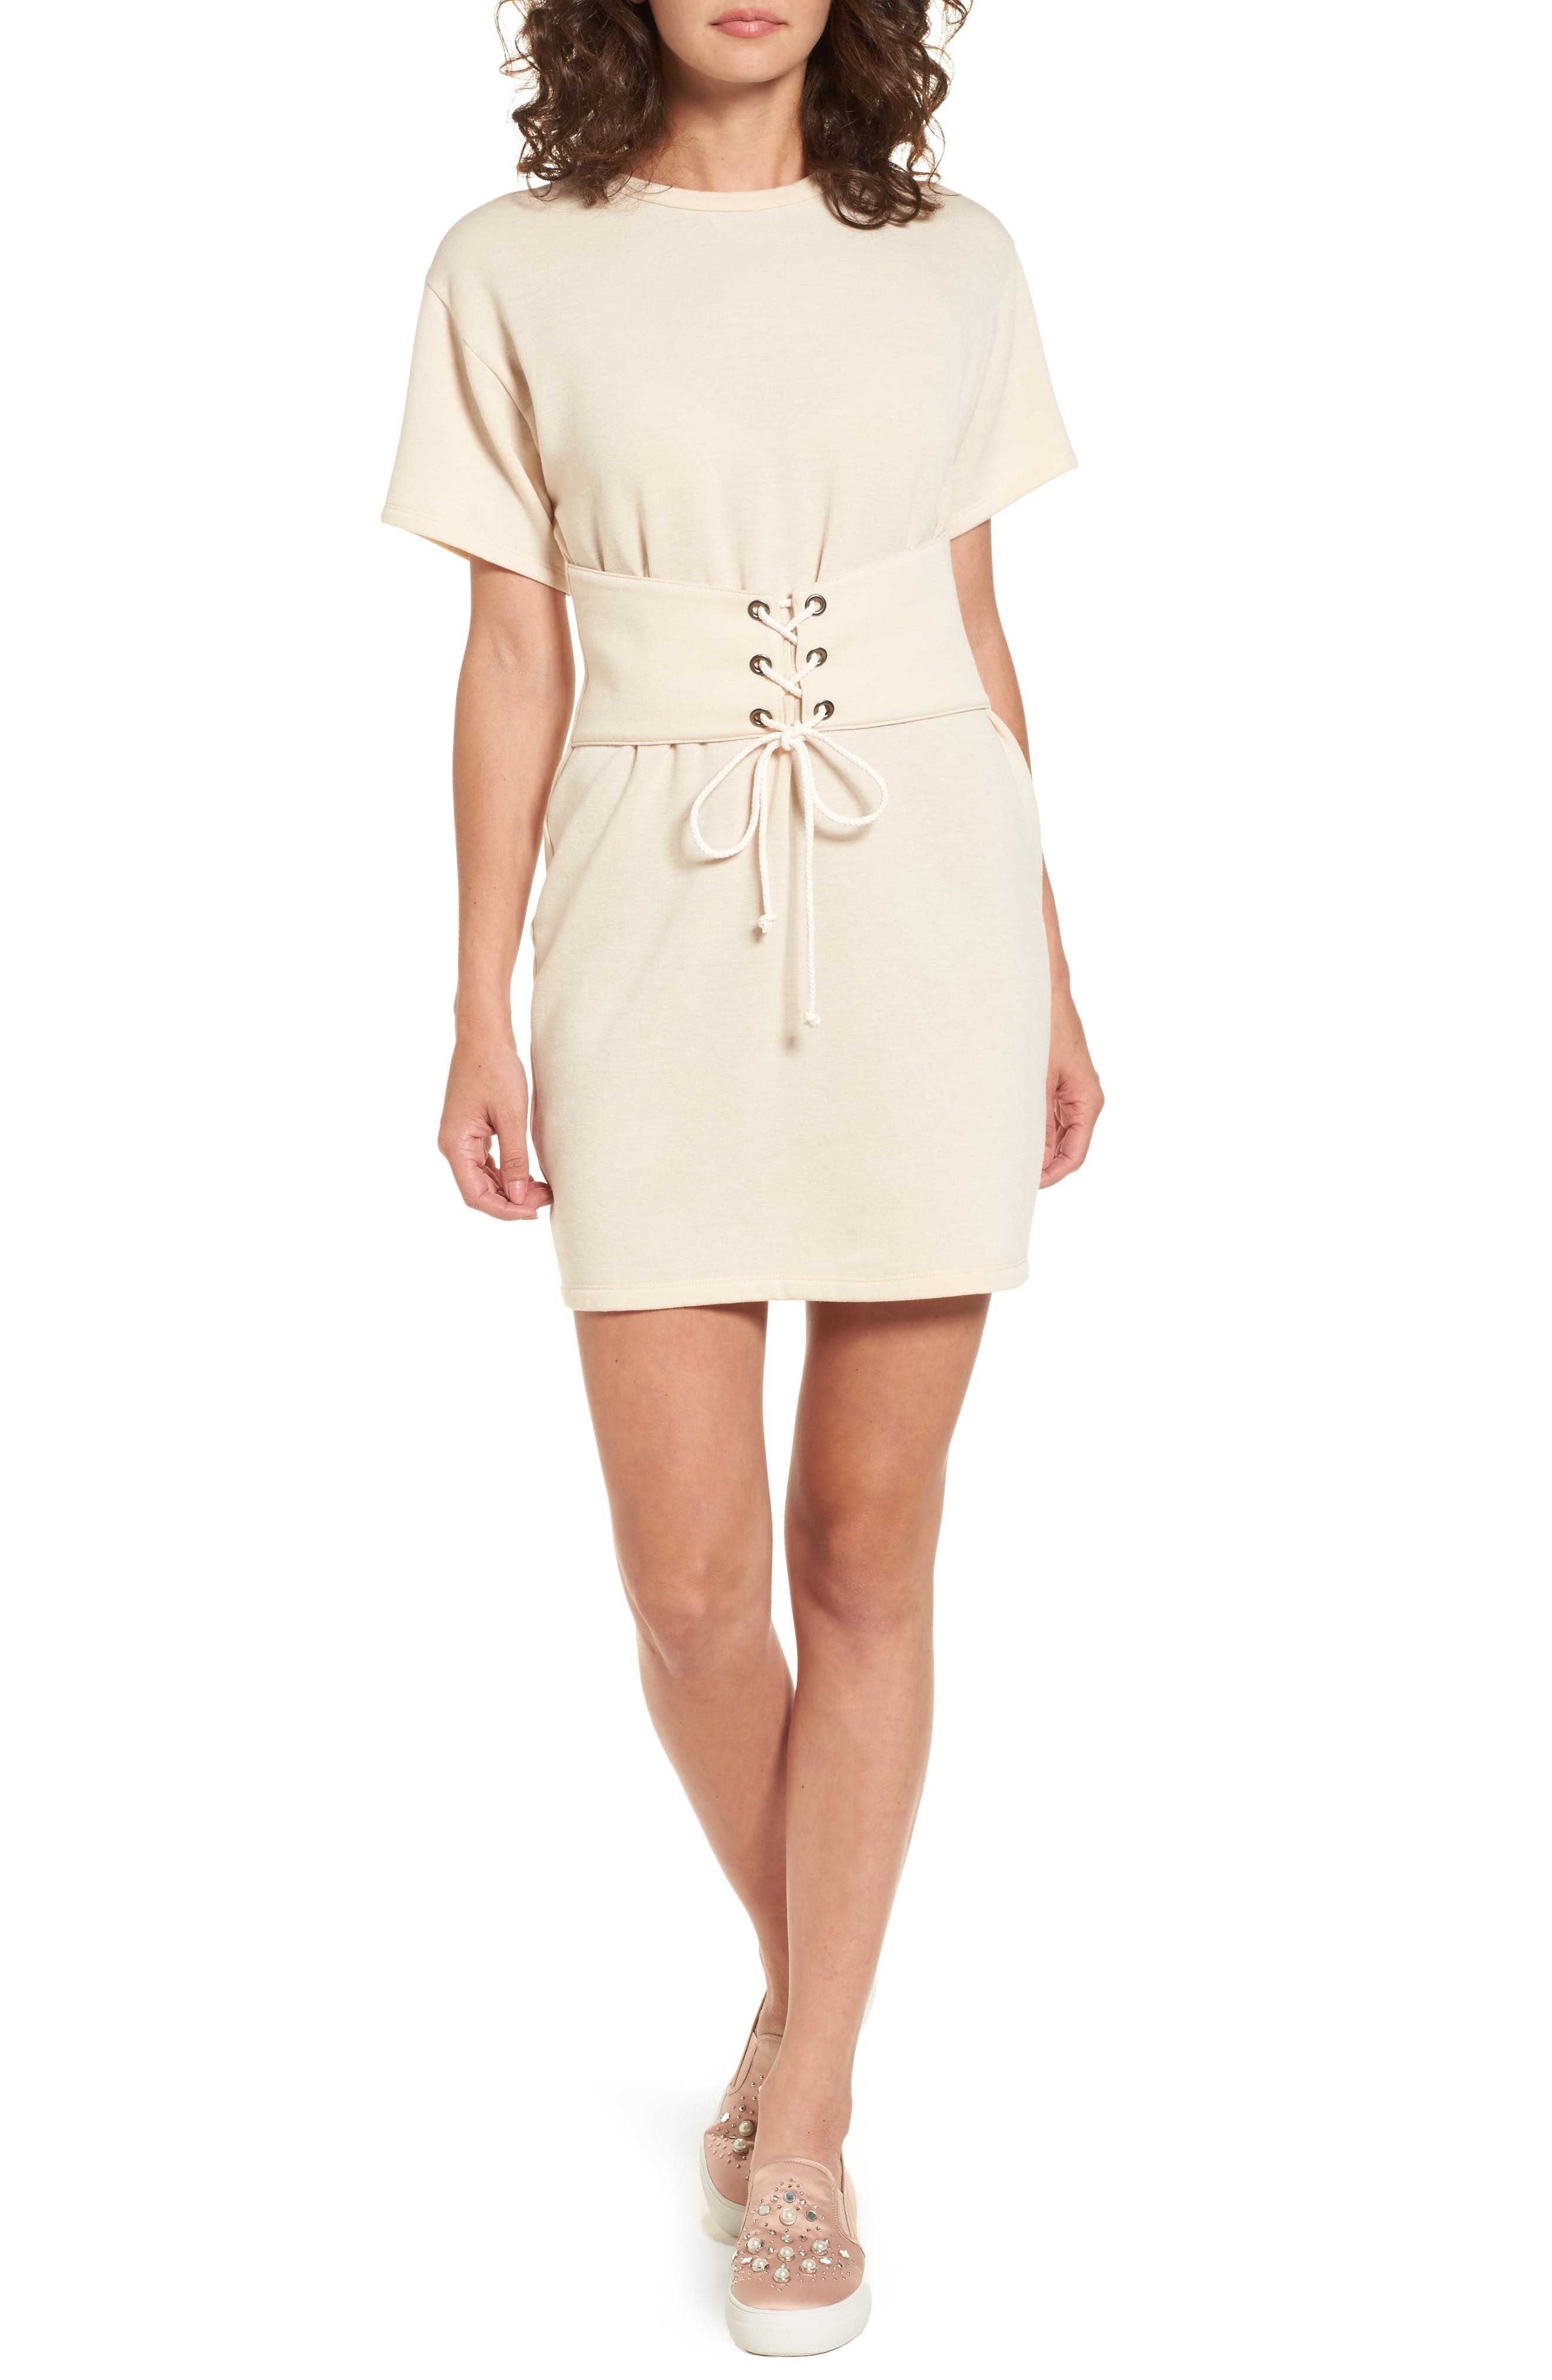 Lush Corset T-Shirt Dress